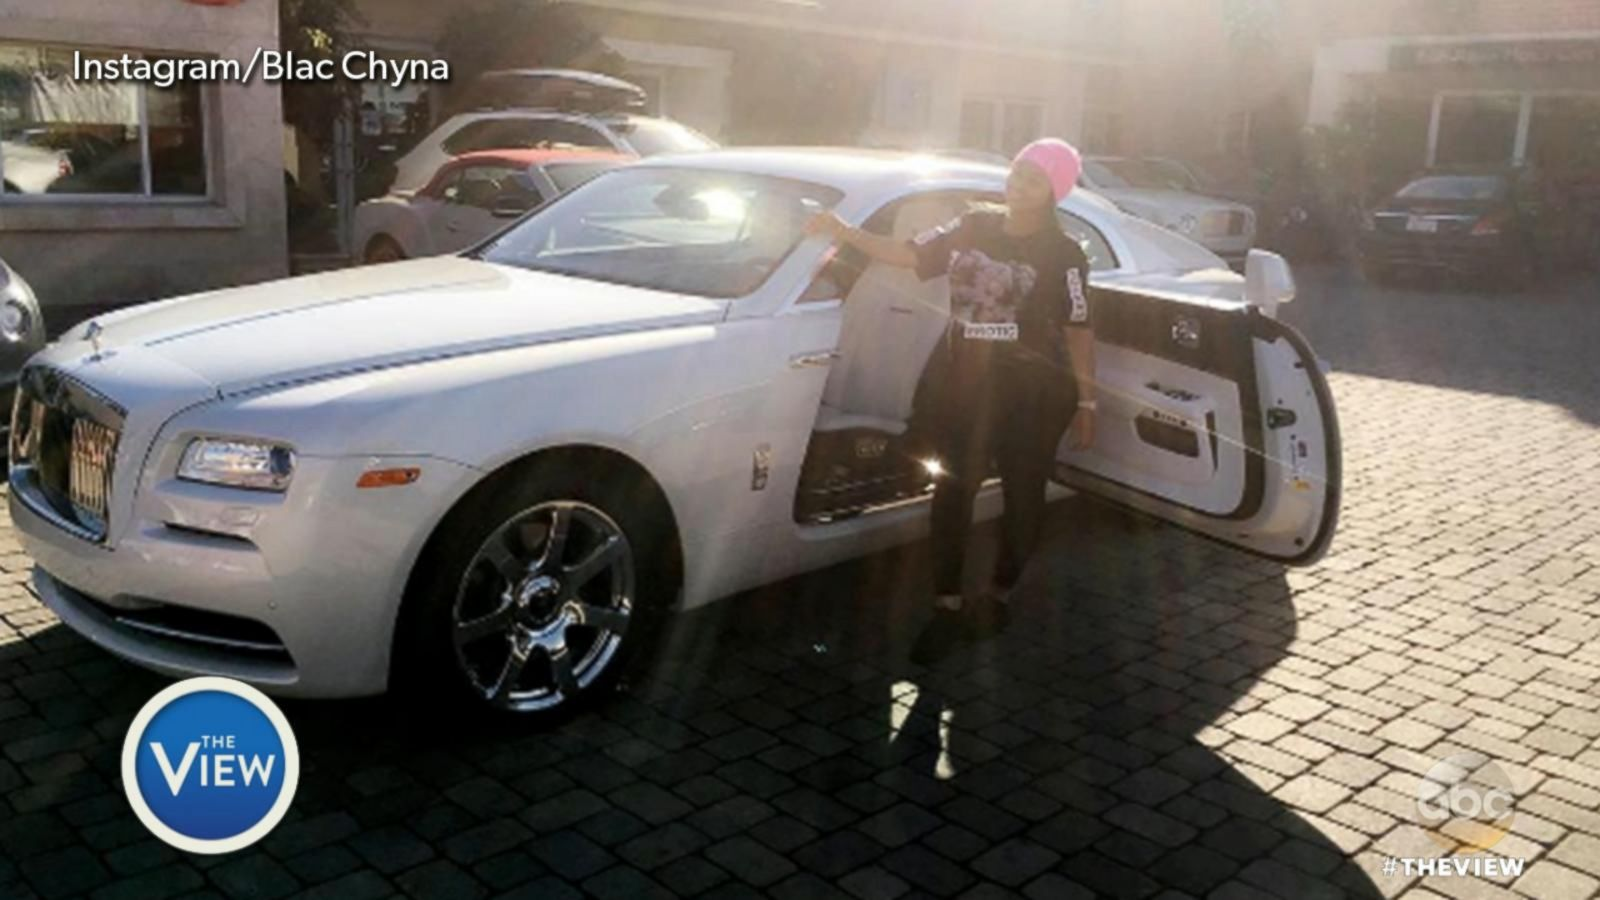 VIDEO: Blac Chyna Buys Herself $400,000 'Push Present'